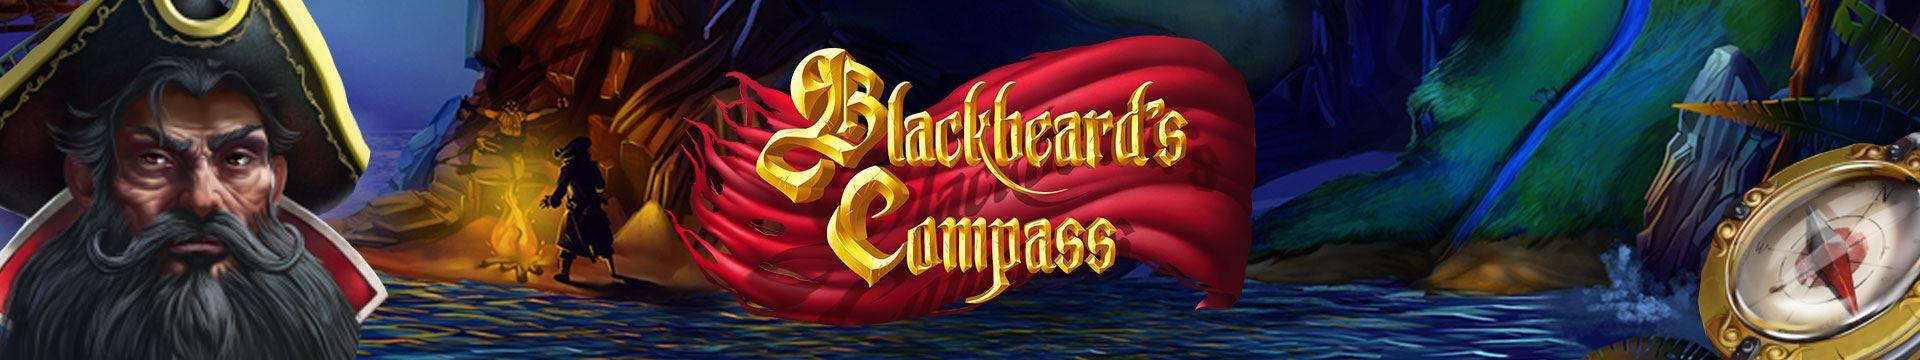 Blackbeard's_Compass